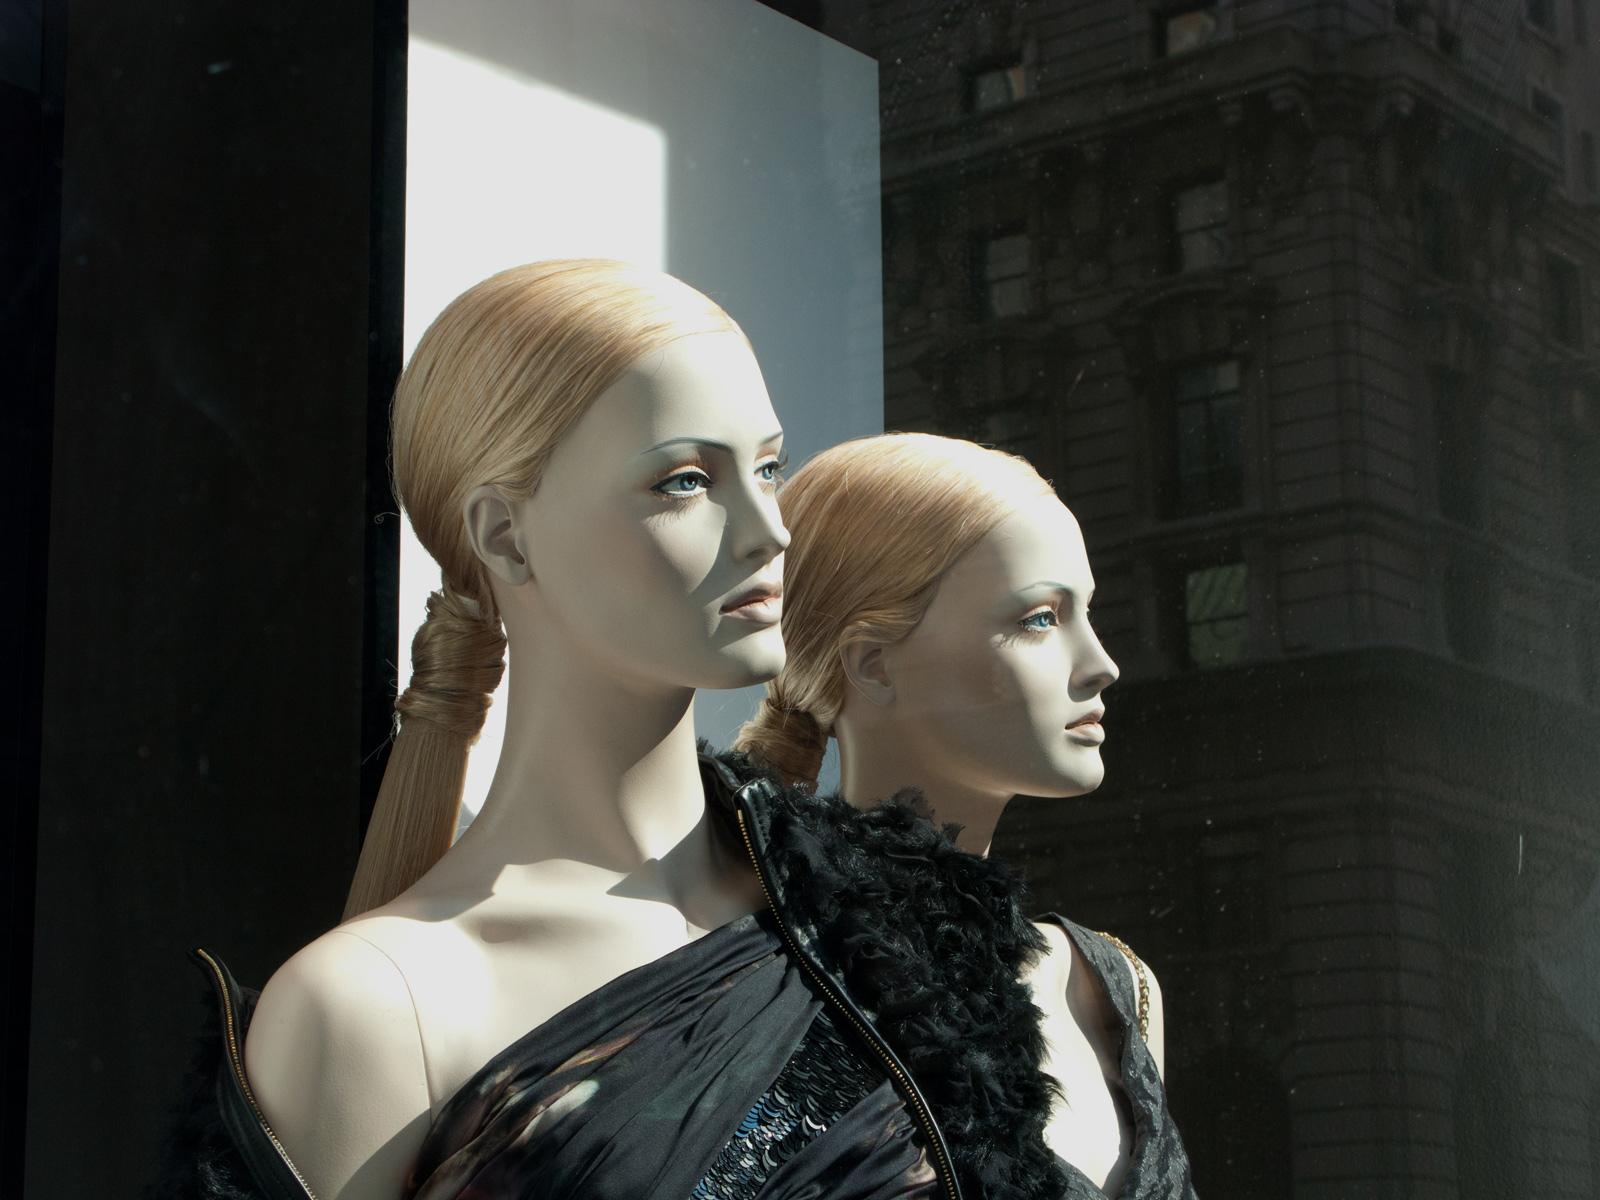 2-manequins22IMG_3011.jpg